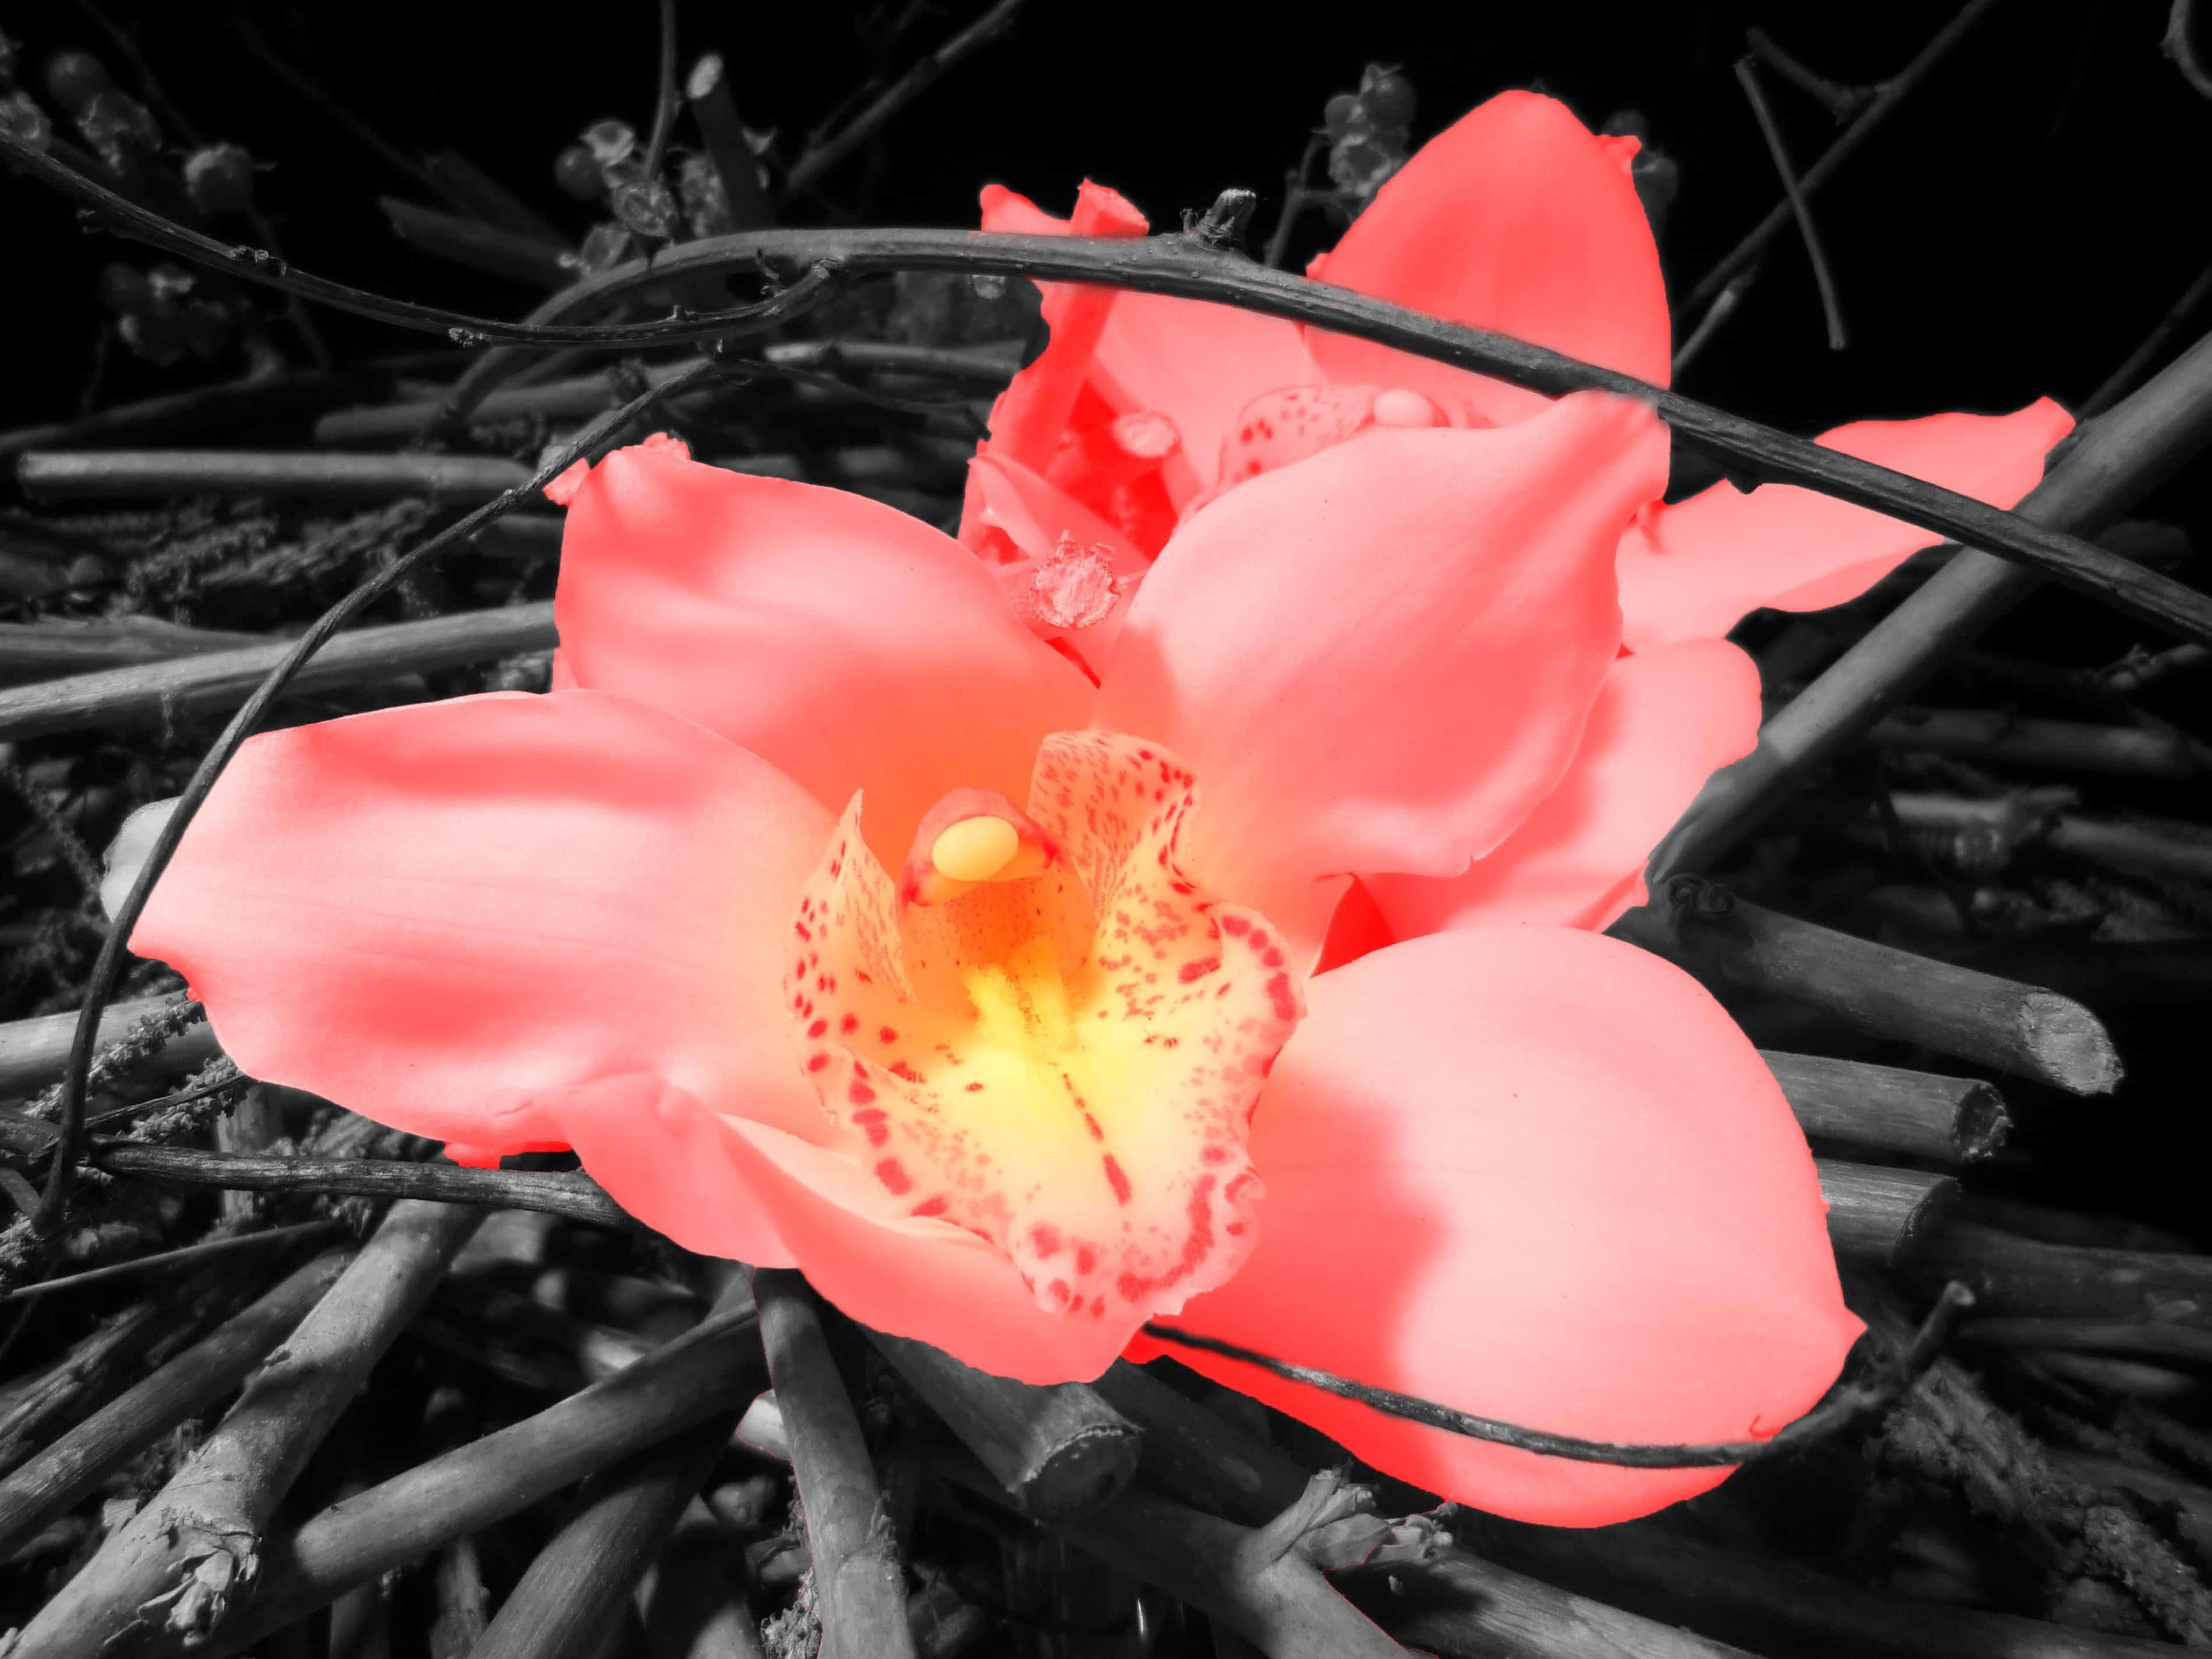 Free picture: flower, plant, petal, oleander, pink, rose, ground